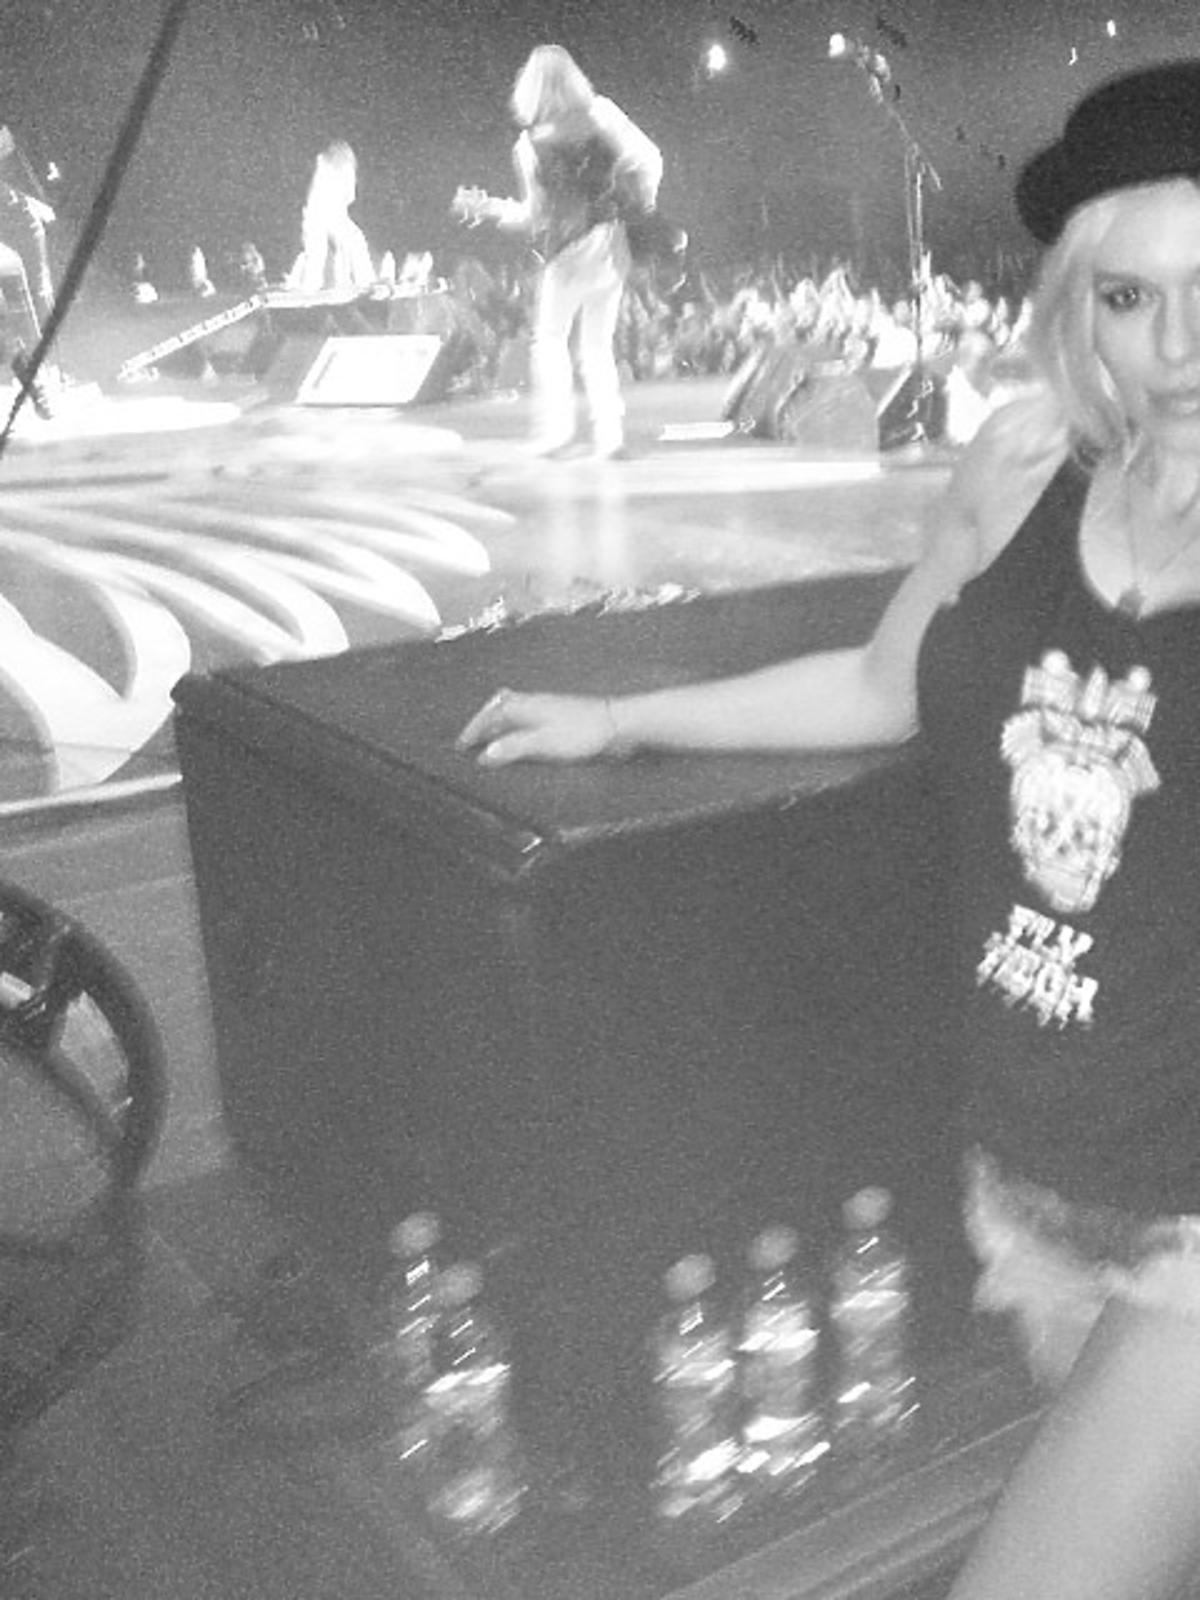 Doda na koncercie Aerosmith